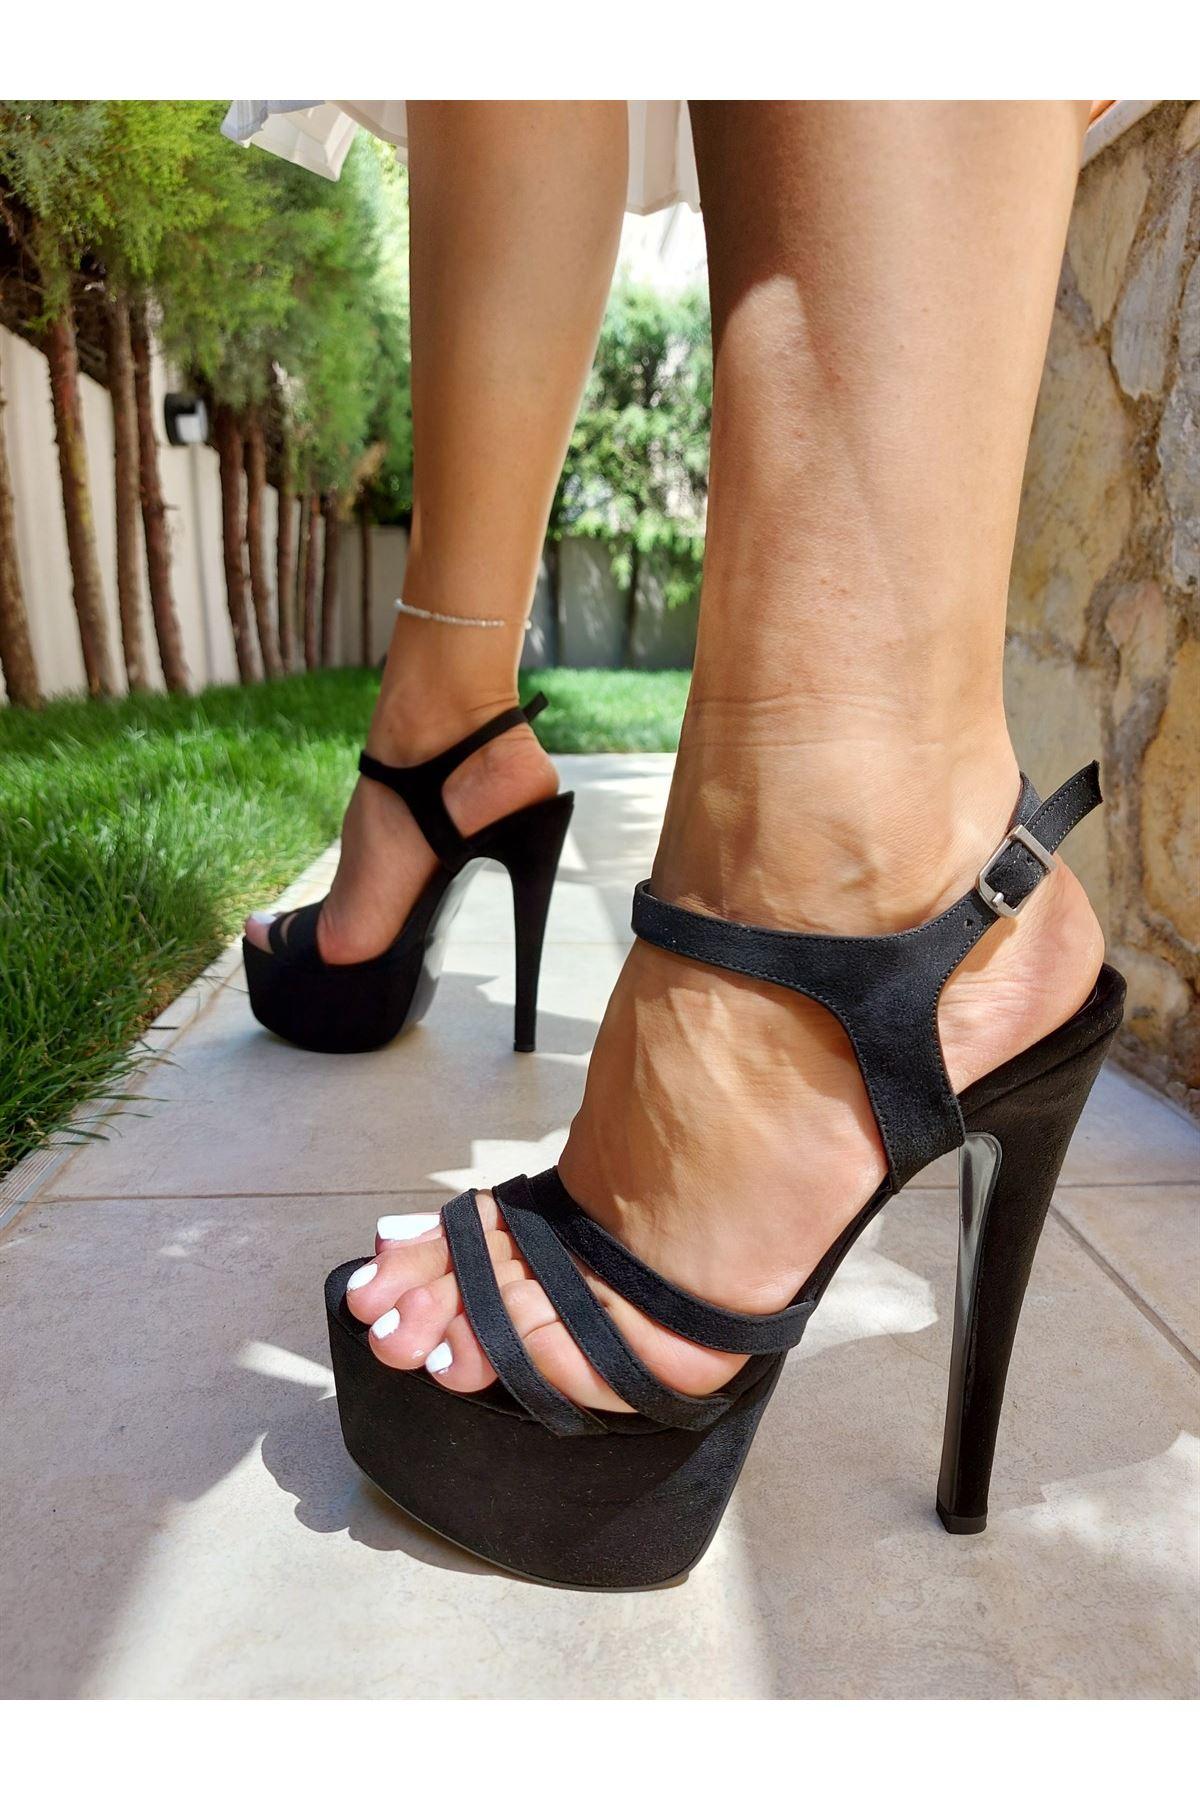 Becca Siyah Süet Yüksek Topuklu Ayakkabı